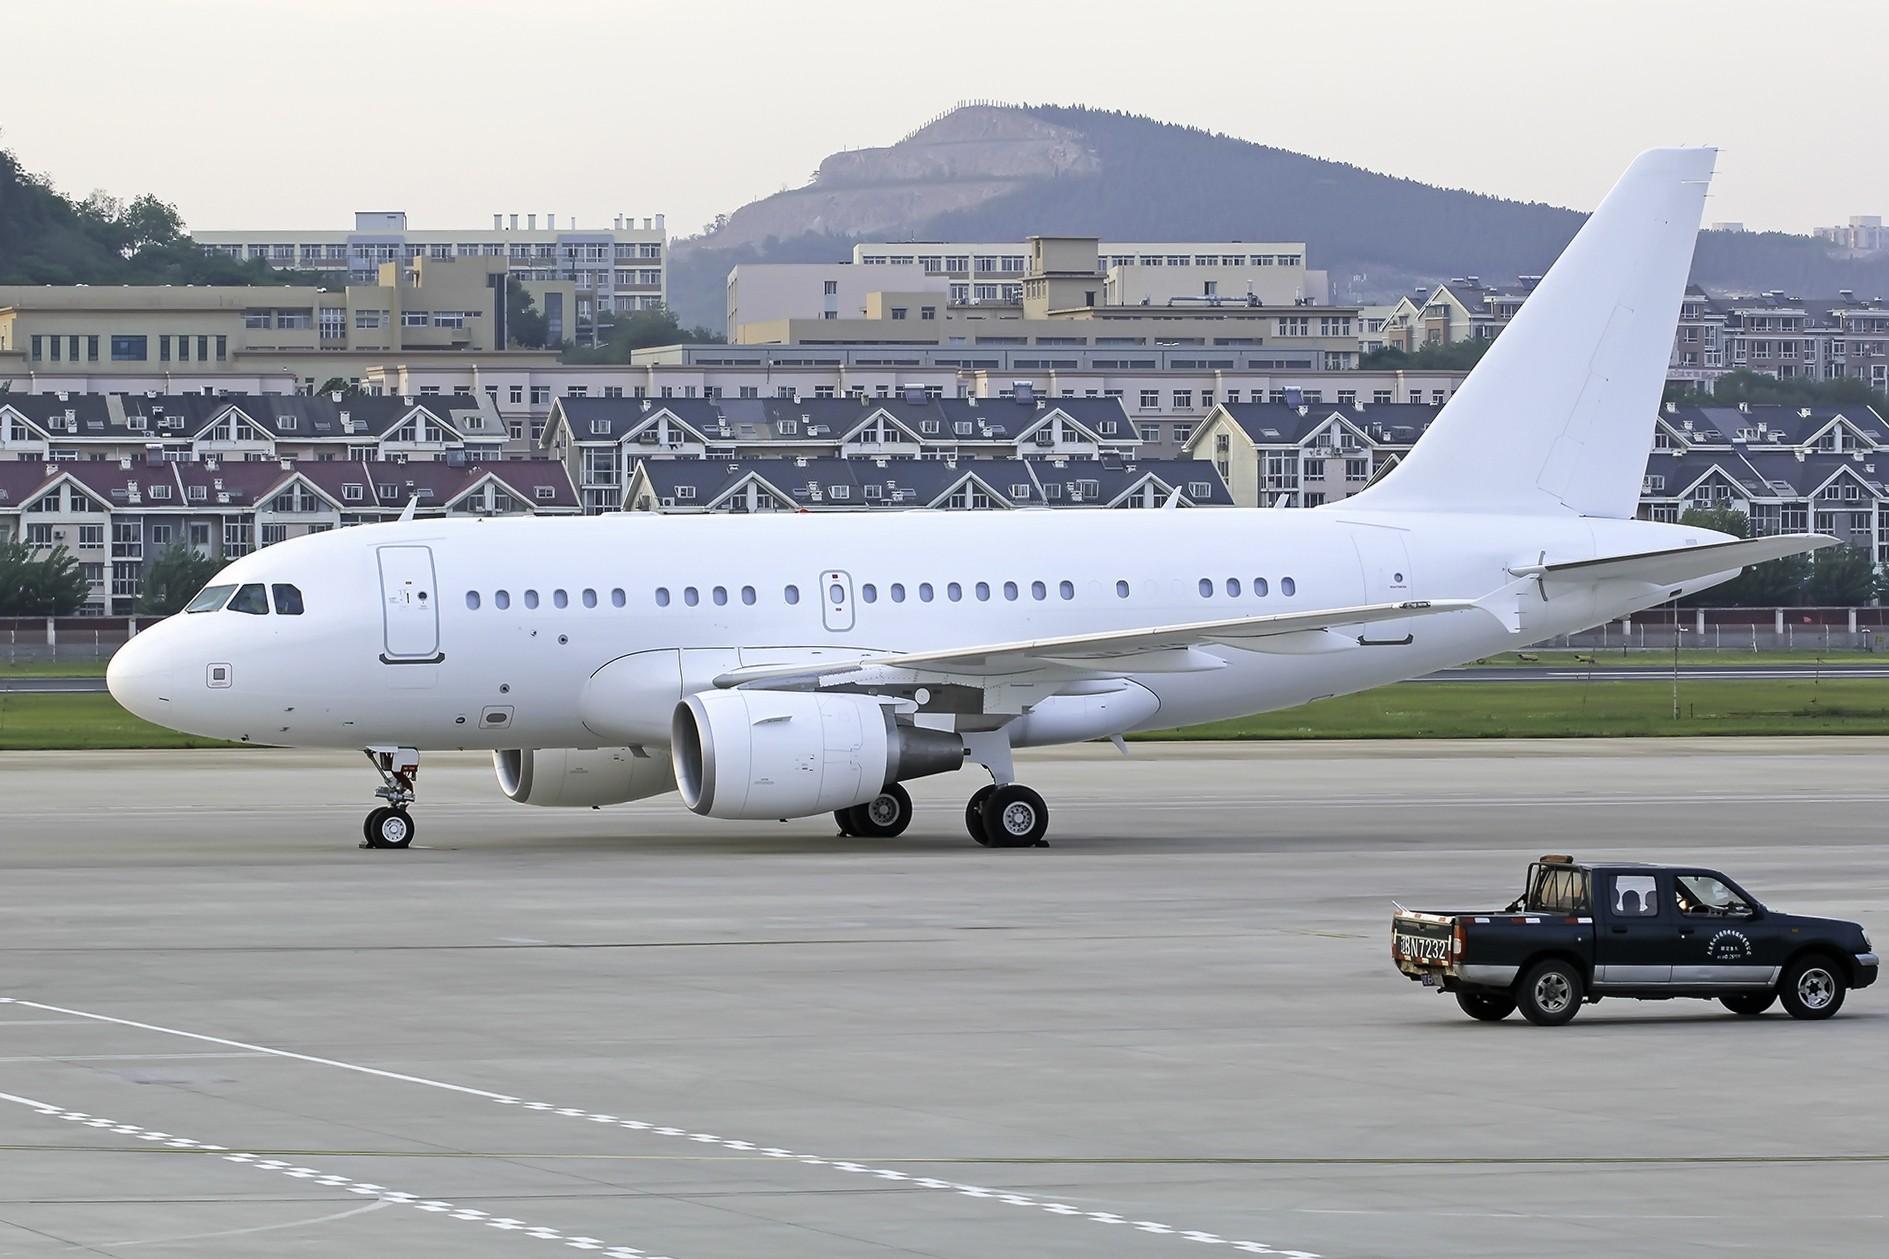 Re:[原创][DLC]滨海大连,浪漫之都….1920x1280pix 连载中 AIRBUS A318 VP-CBY 中国大连周水子国际机场